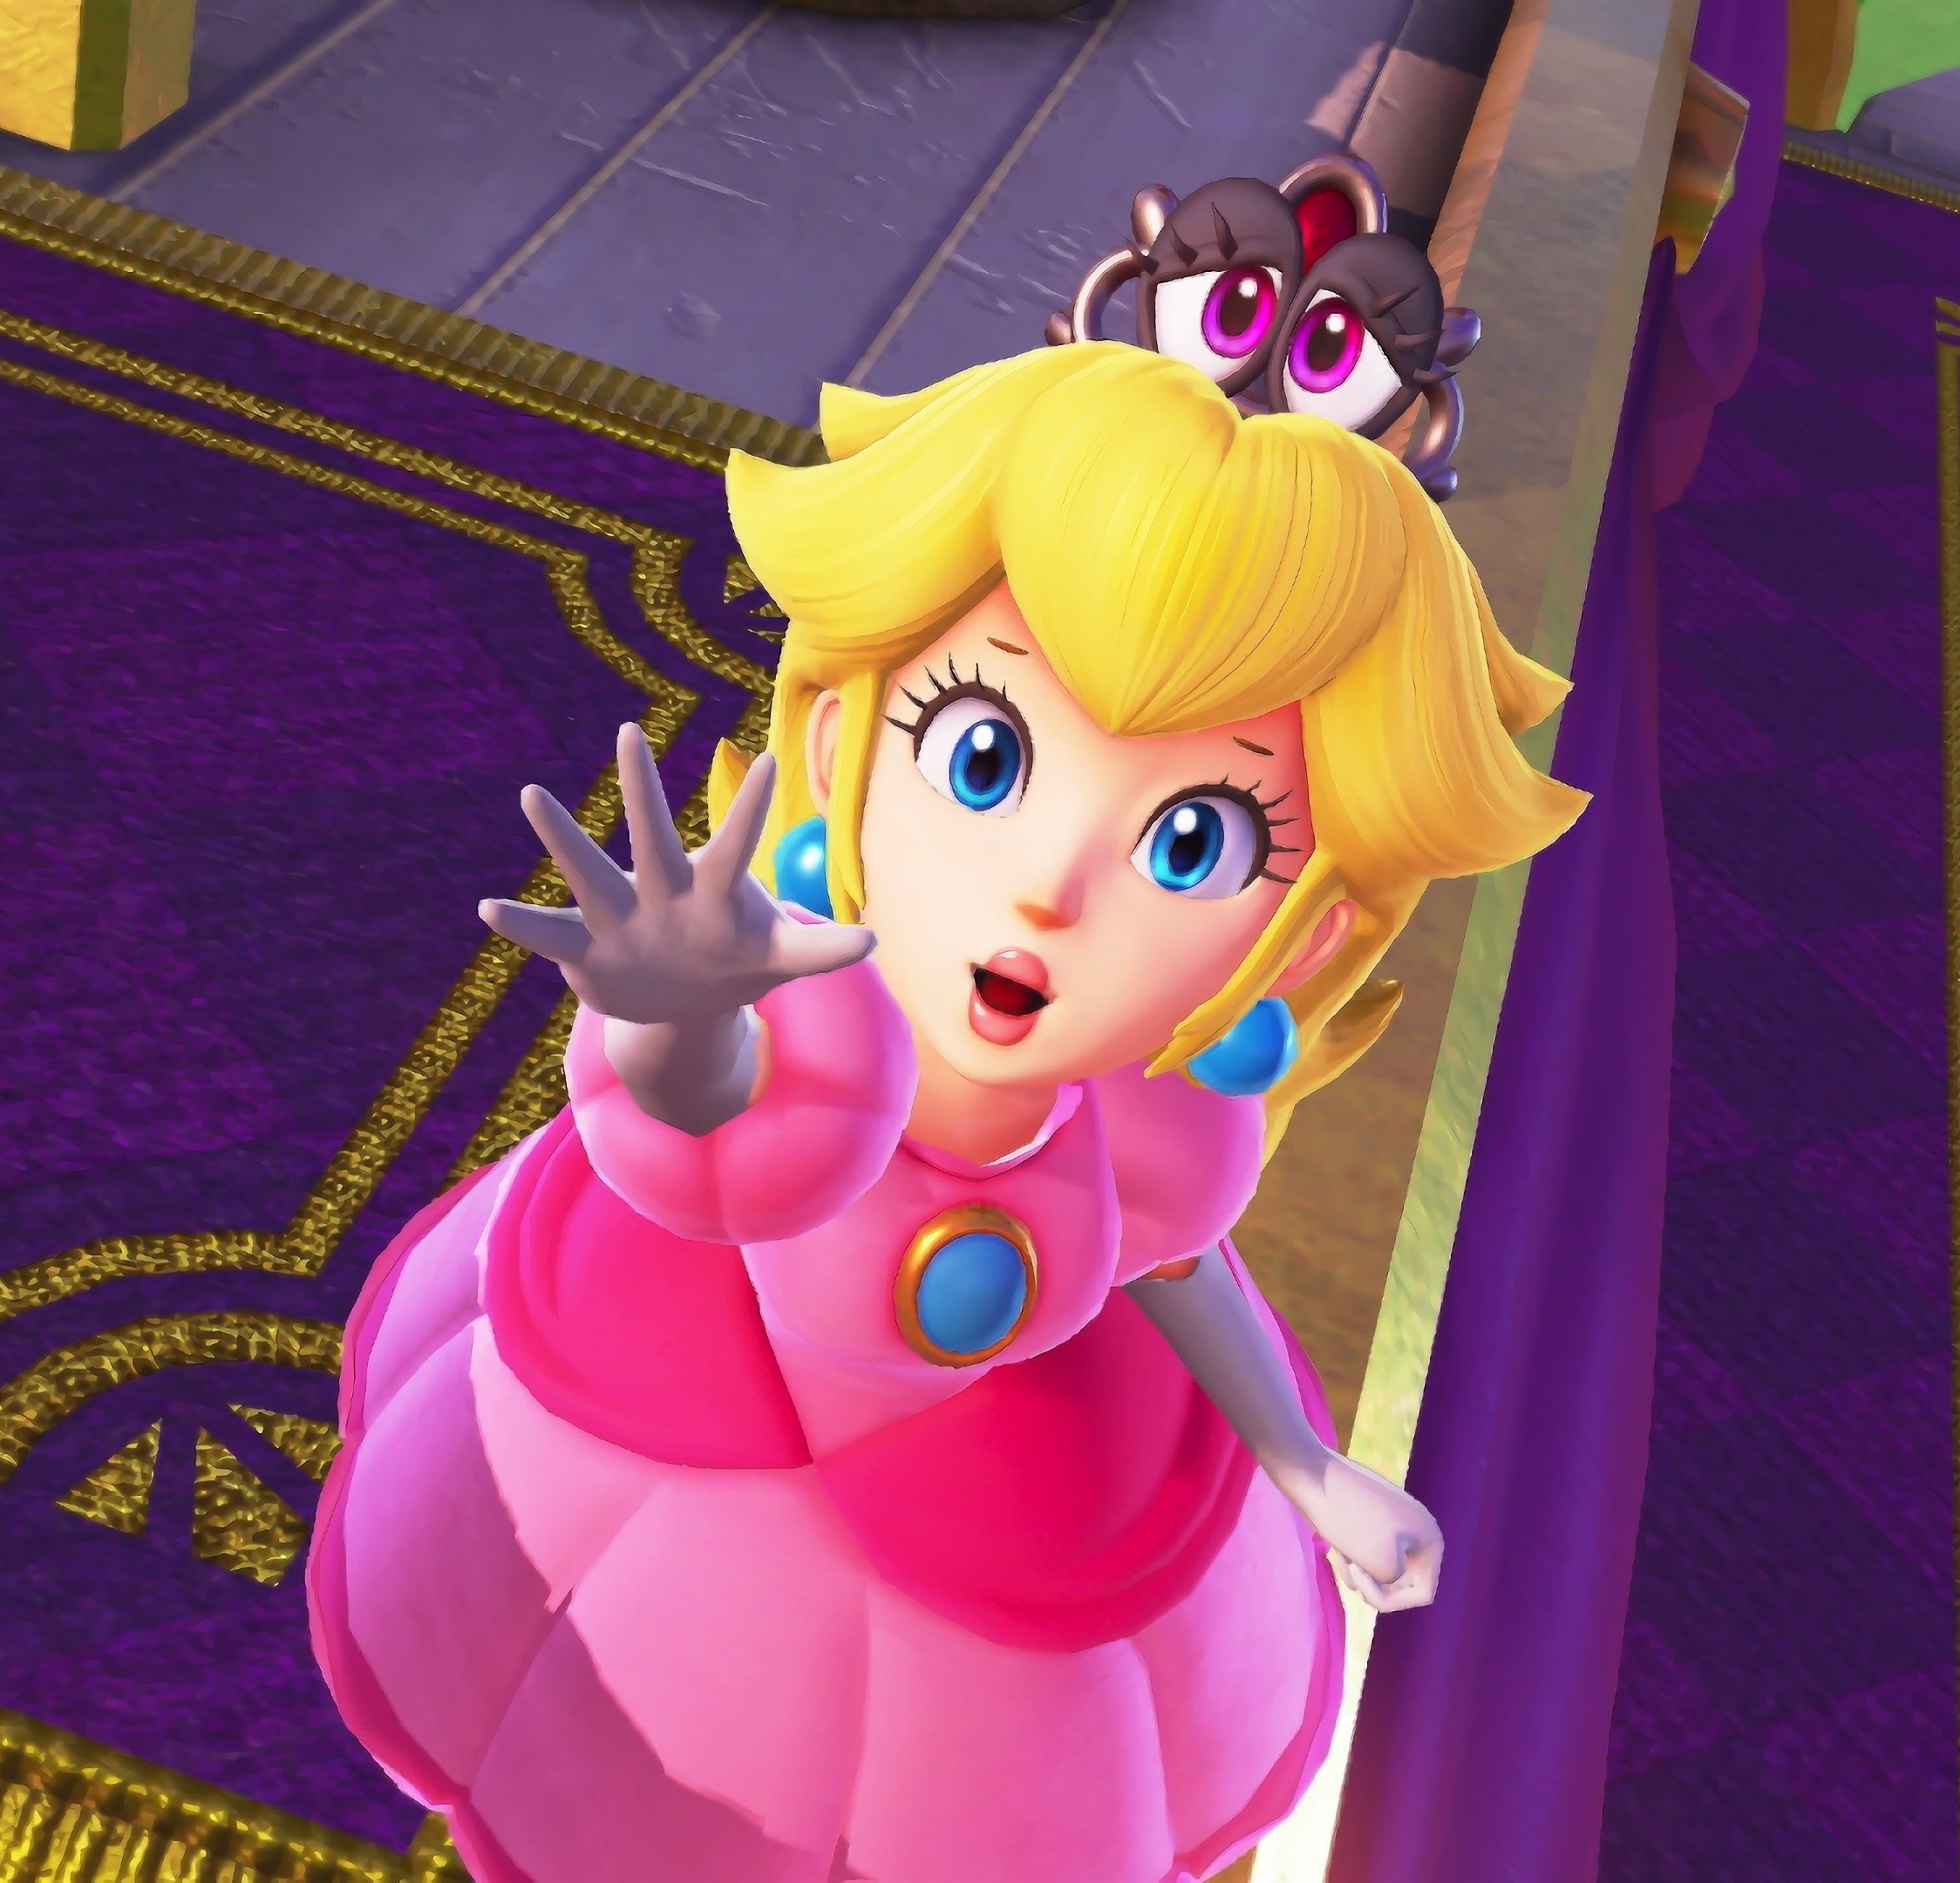 Download 2248x2248 Wallpaper Blonde Princess Super Mario Odyssey